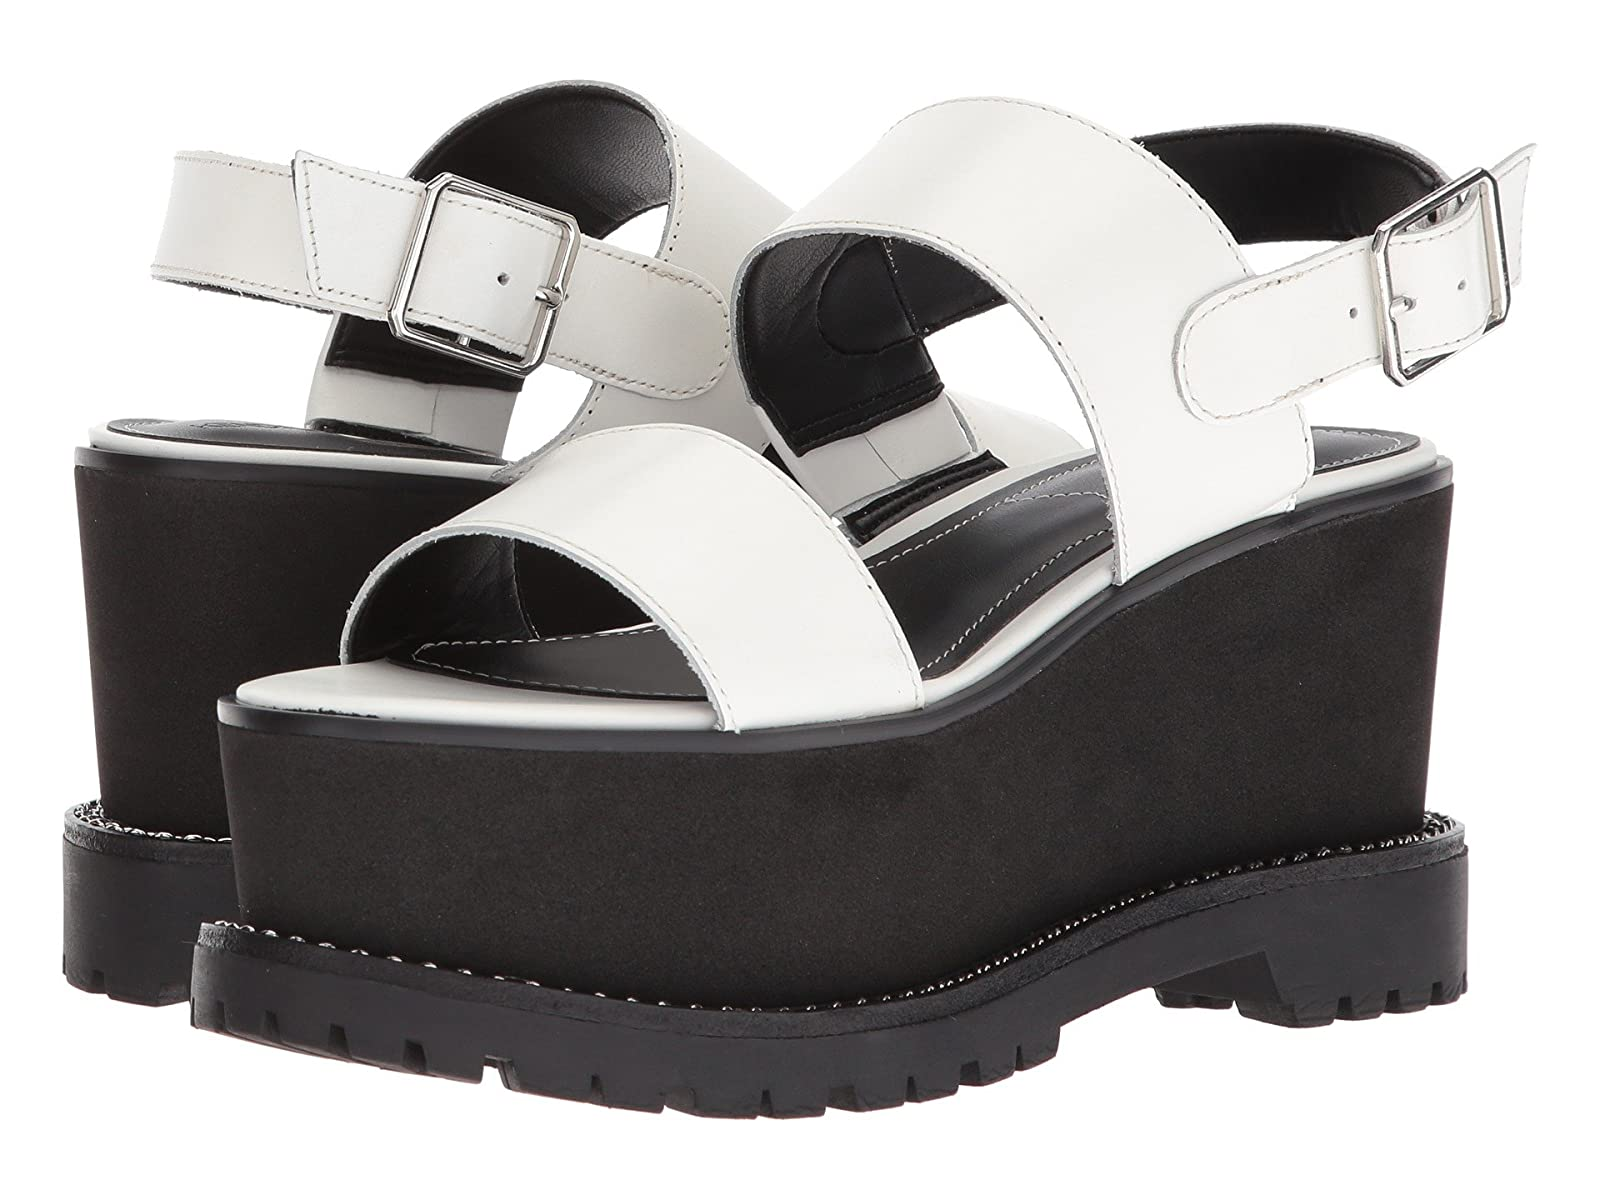 KENDALL + KYLIE CadyAtmospheric grades have affordable shoes